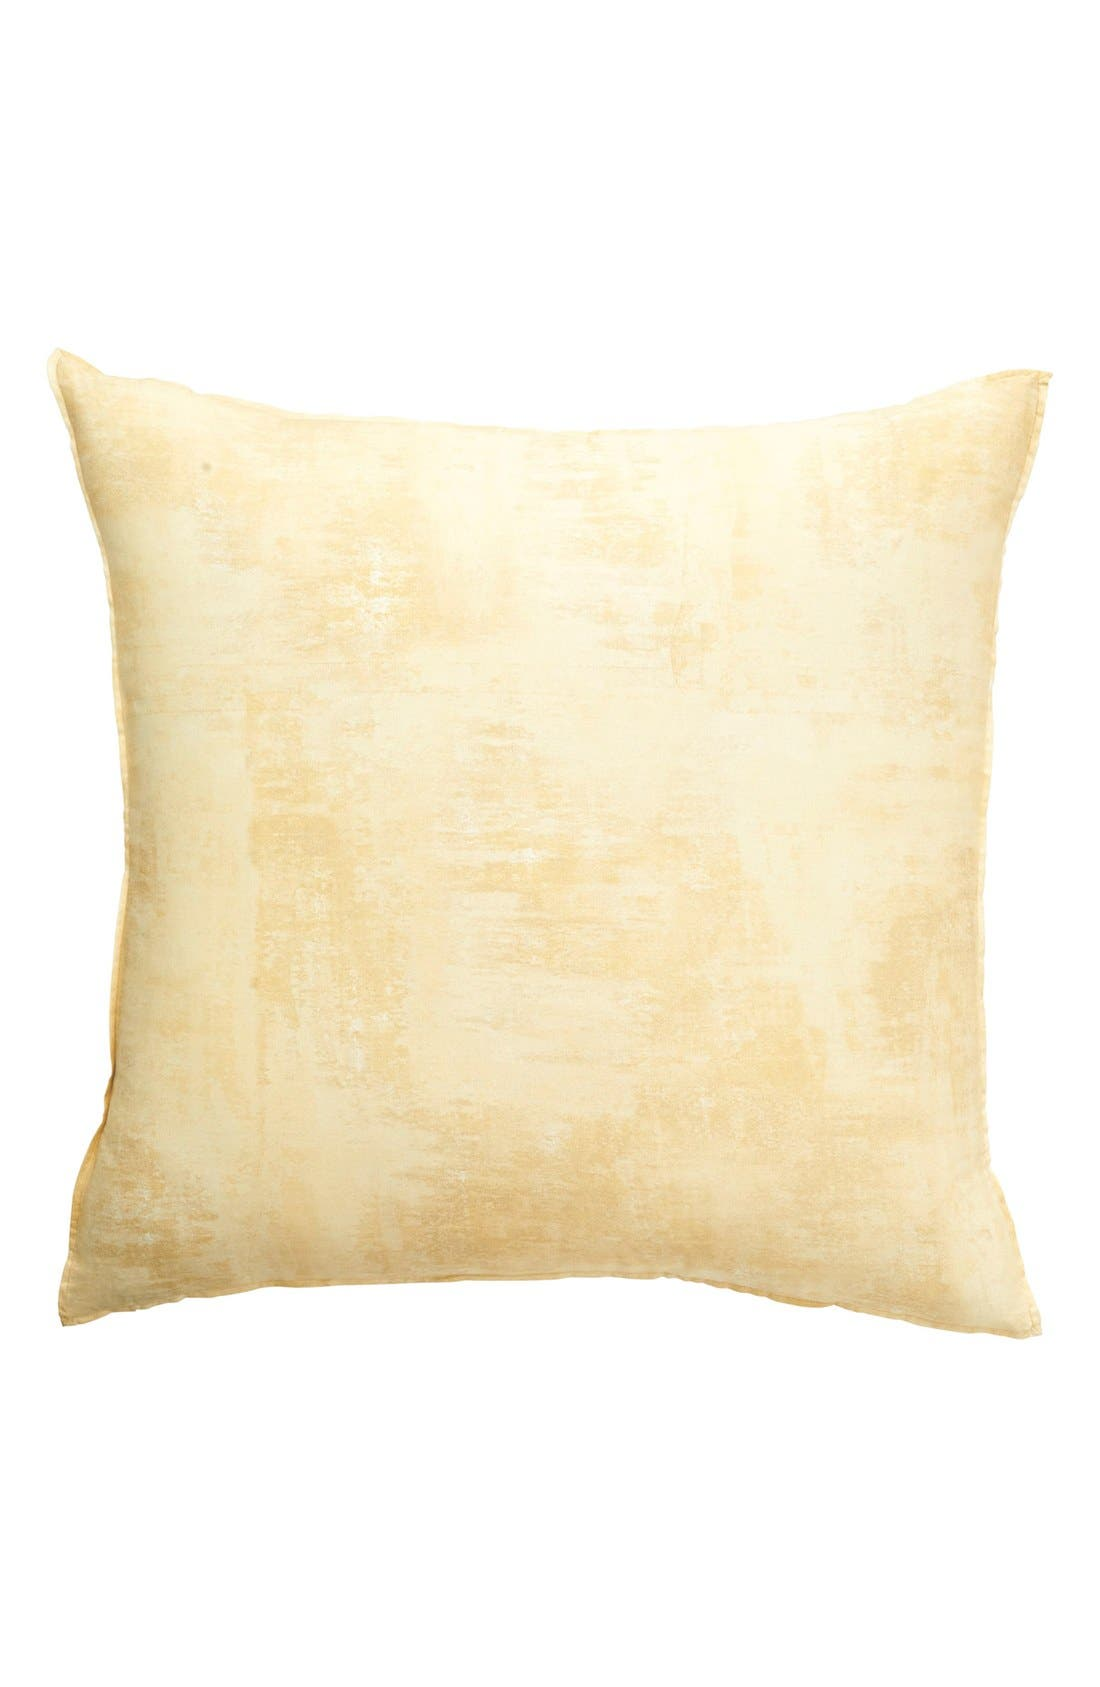 Alternate Image 1 Selected - Donna Karan 'Atmosphere' Euro Pillow Sham (Online Only)